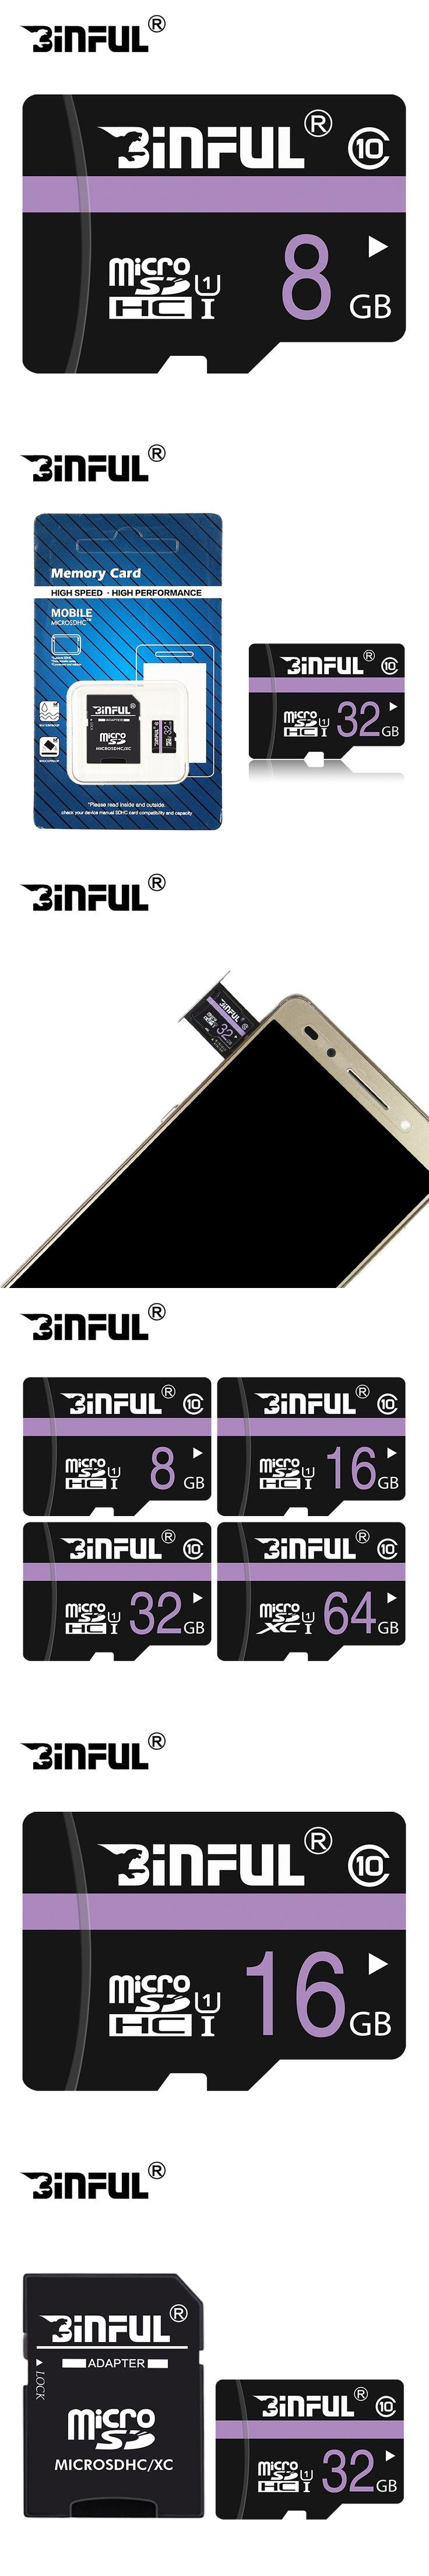 BiNFUL Micro SD Card 4GB 8GB 16GB 32GB 64GB Memory Card Class10 For Phone/Tablet/Camera TF Card High Speed Transflash Card